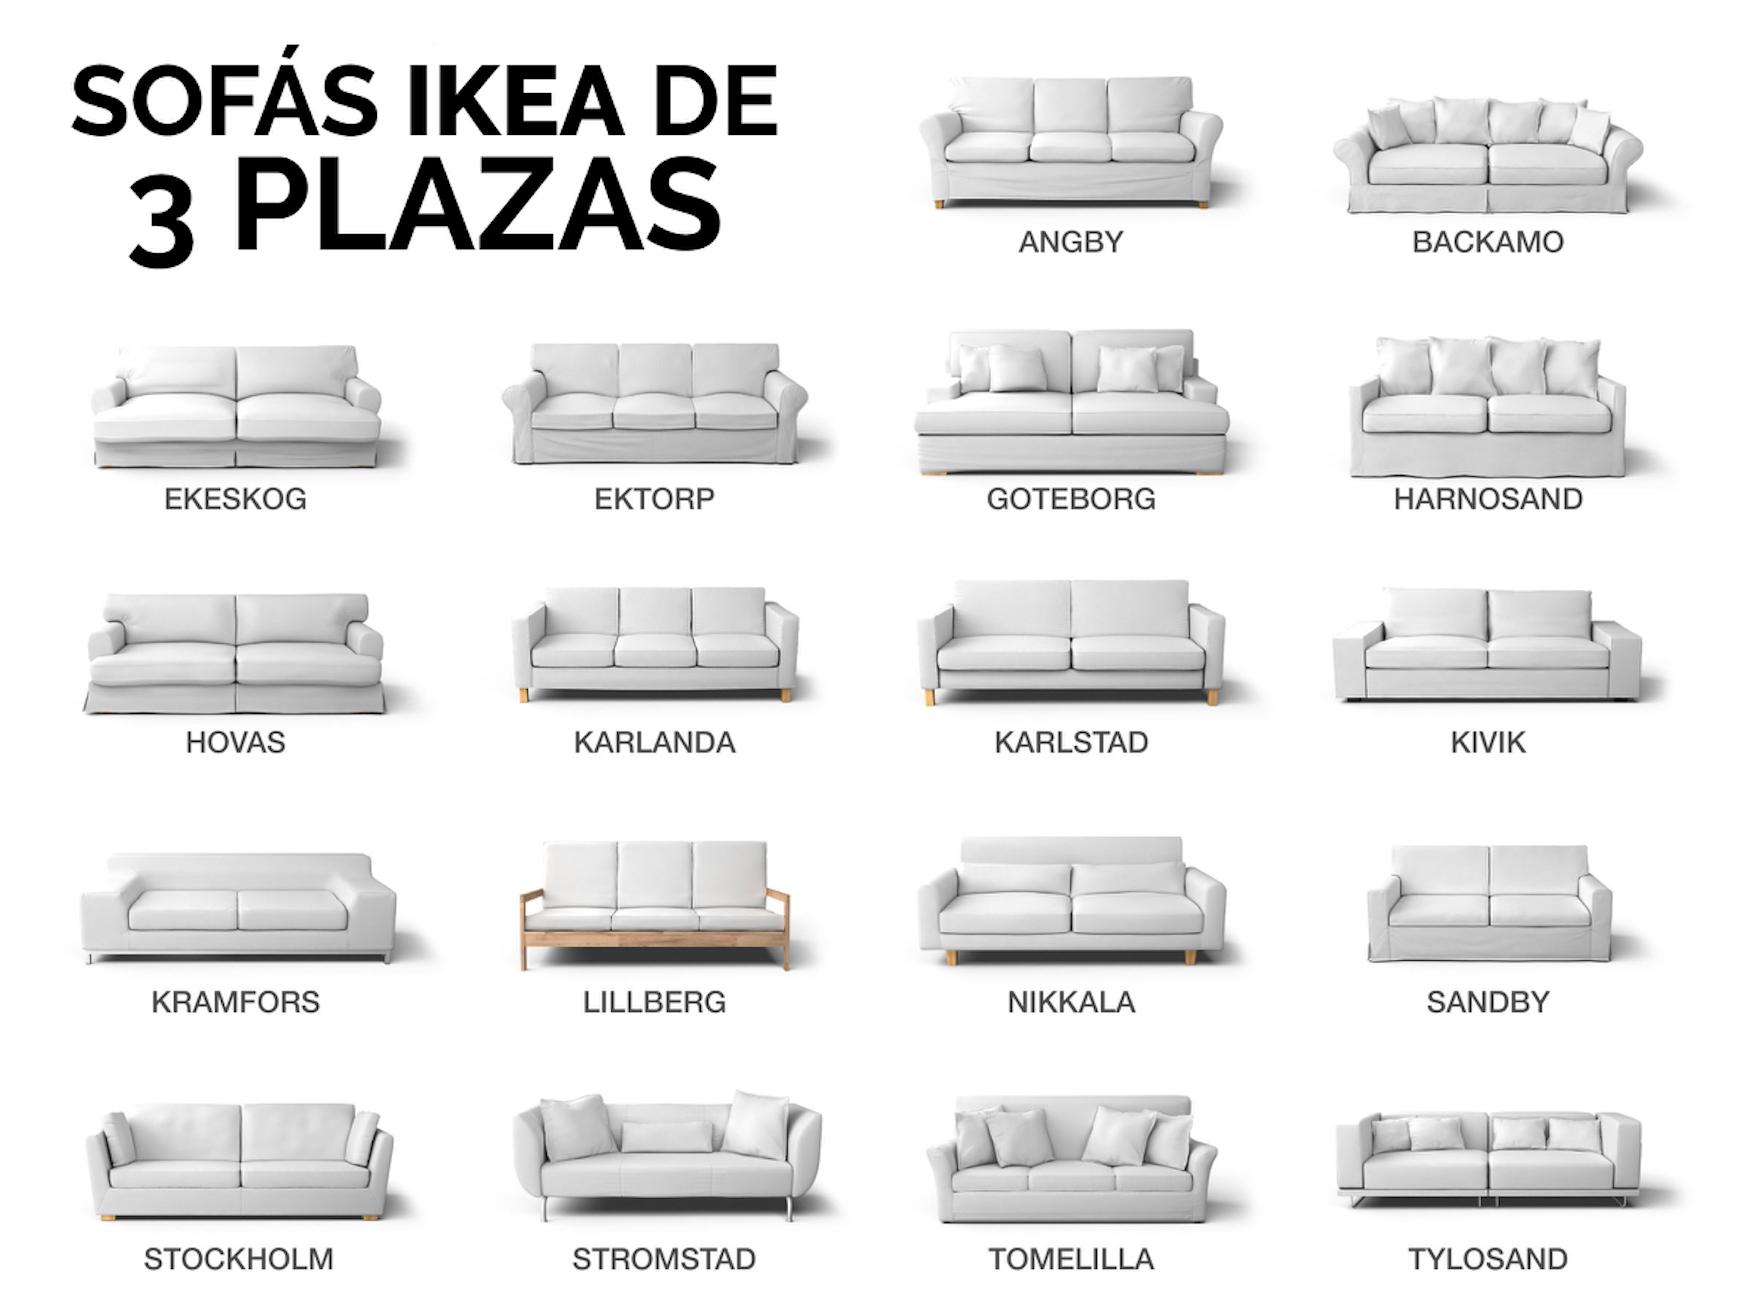 ¿Qué sofá IKEA de 3 plazas tengo? - Identifica tu sofá IKEA